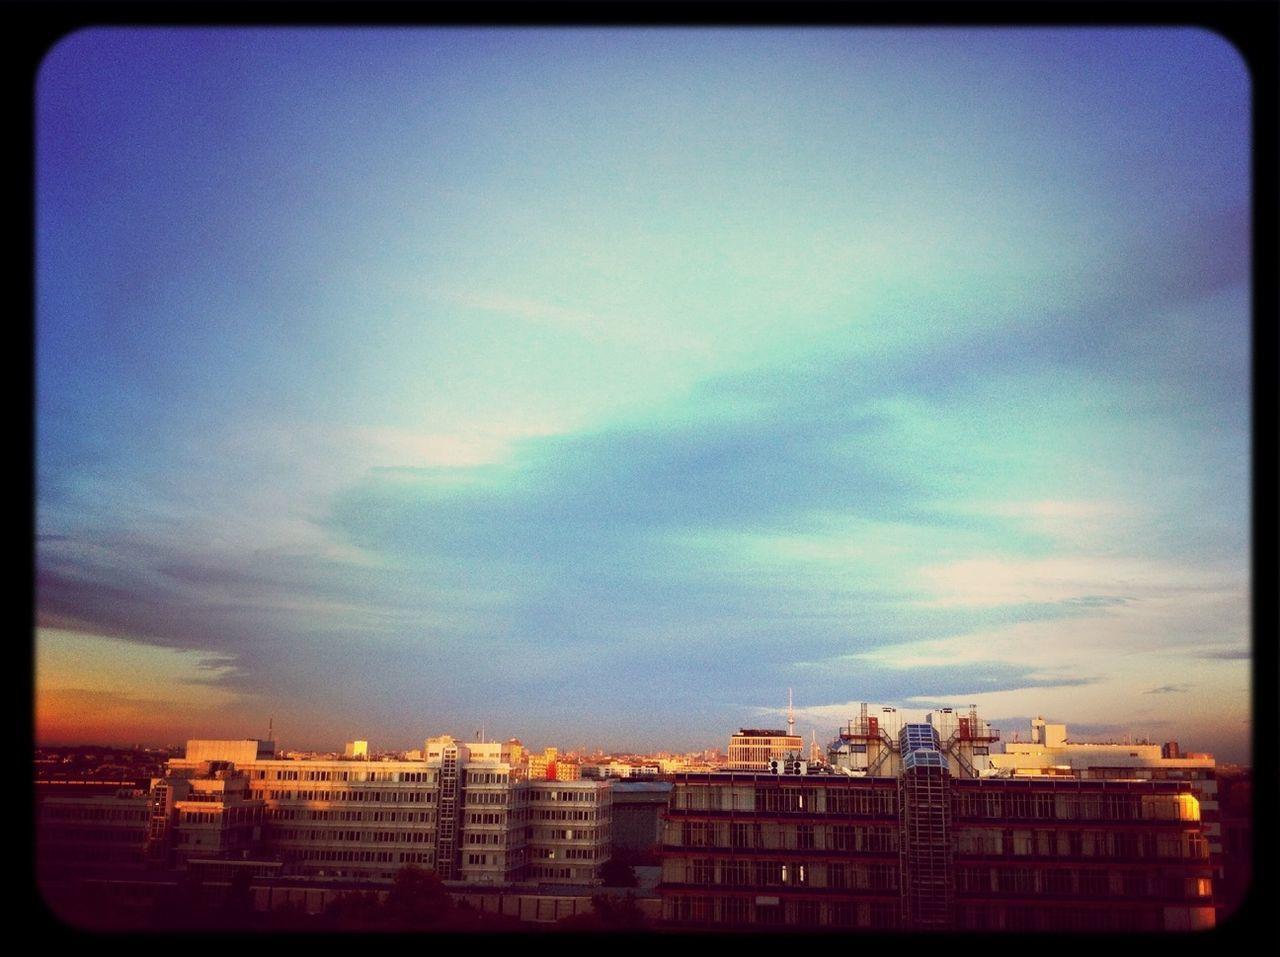 architecture, building exterior, built structure, city, cityscape, sky, no people, skyline, skyscraper, cloud - sky, outdoors, day, urban skyline